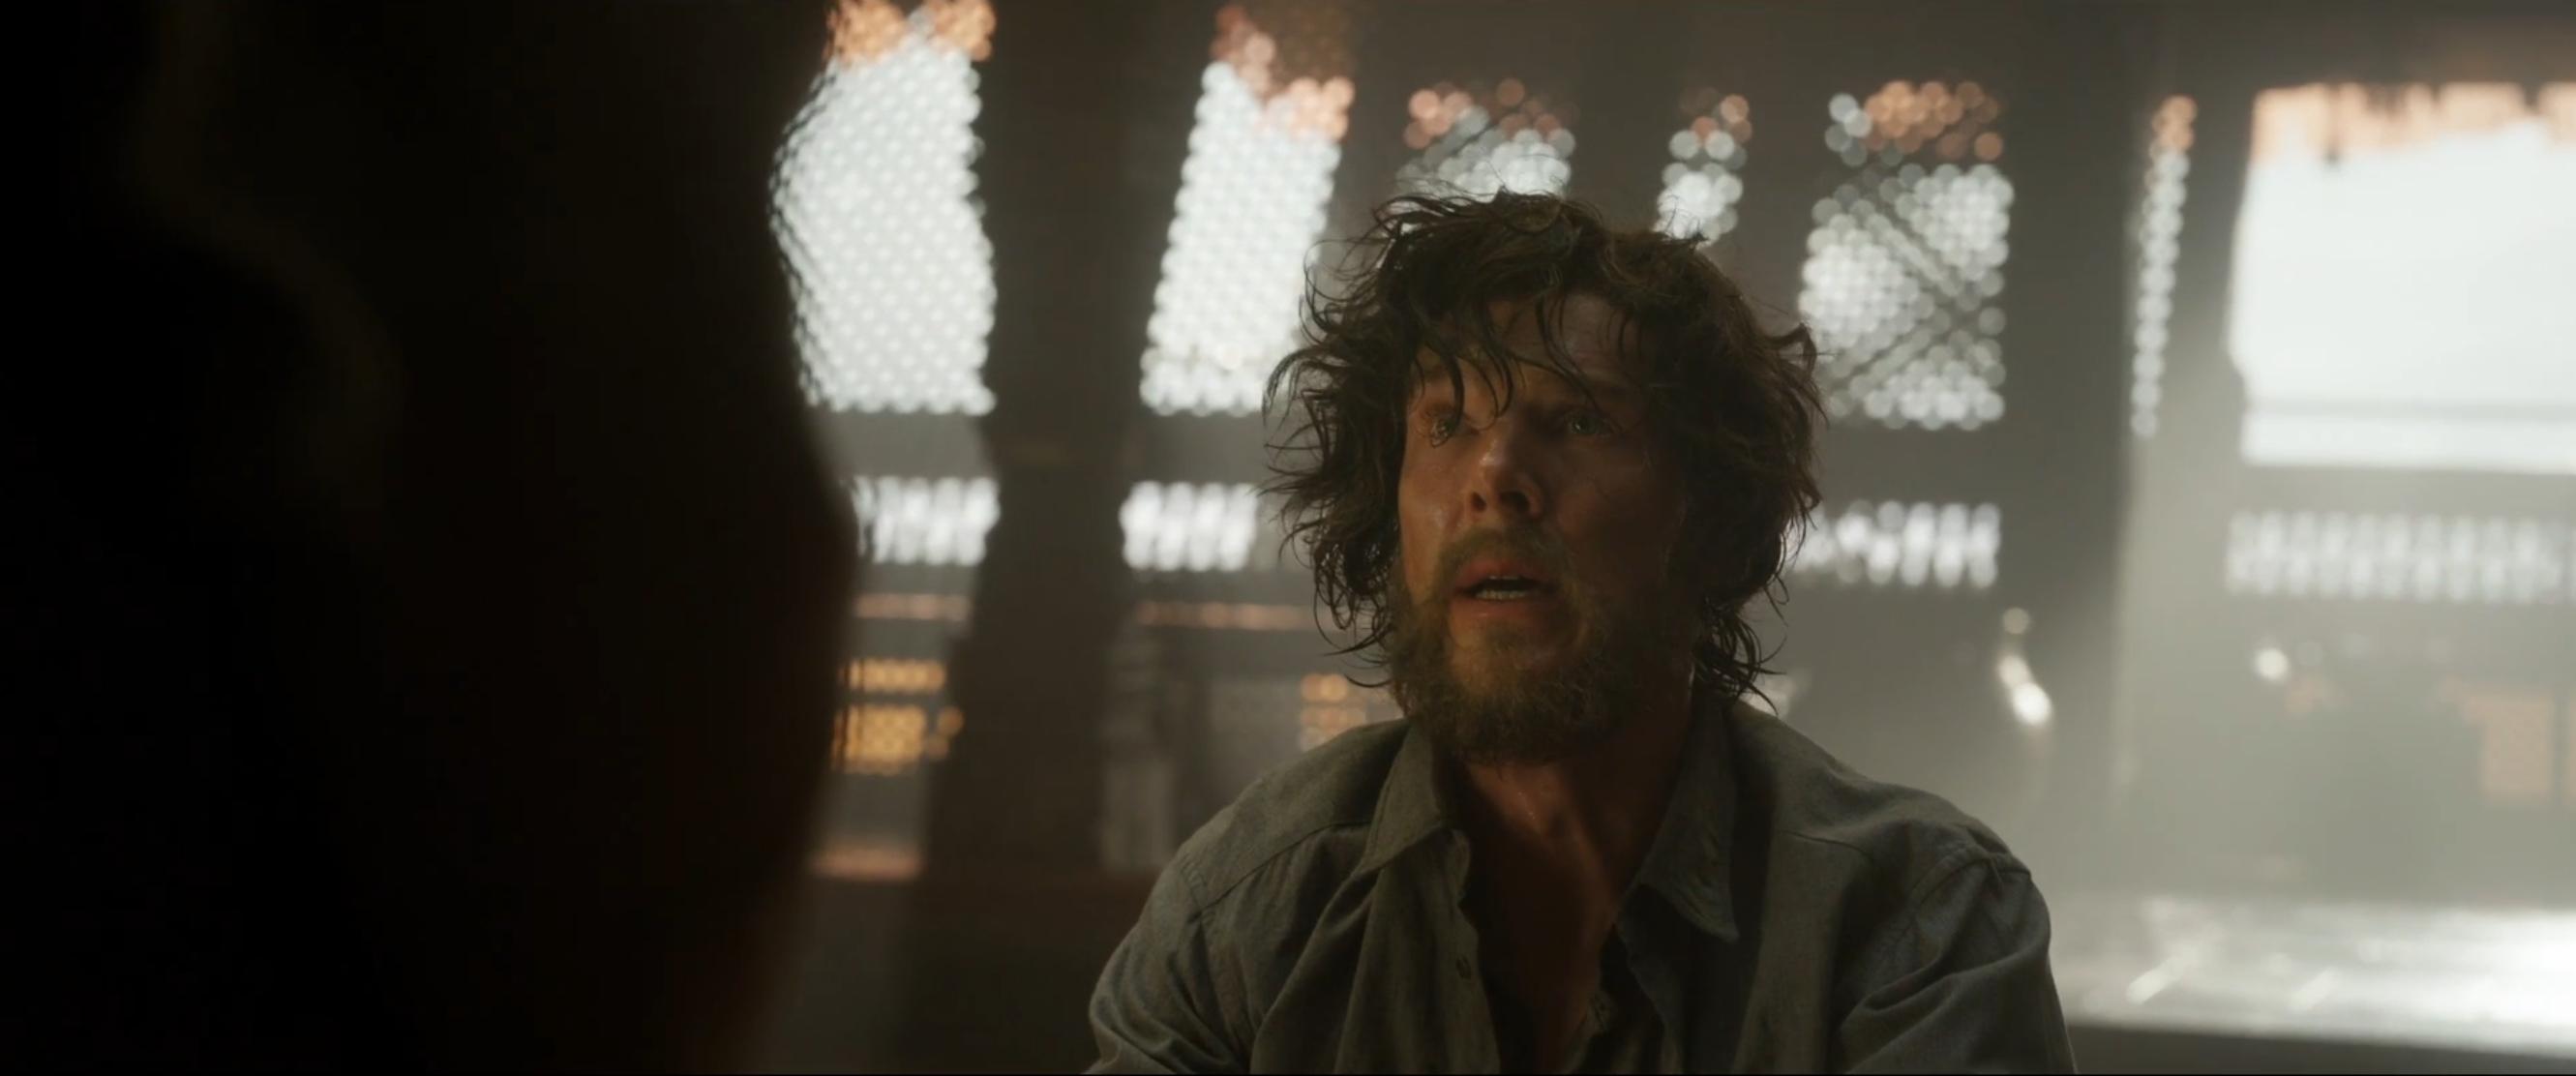 Doctor Strange: un intenso Benedict Cumberbatch nel teaser trailer del film Marvel